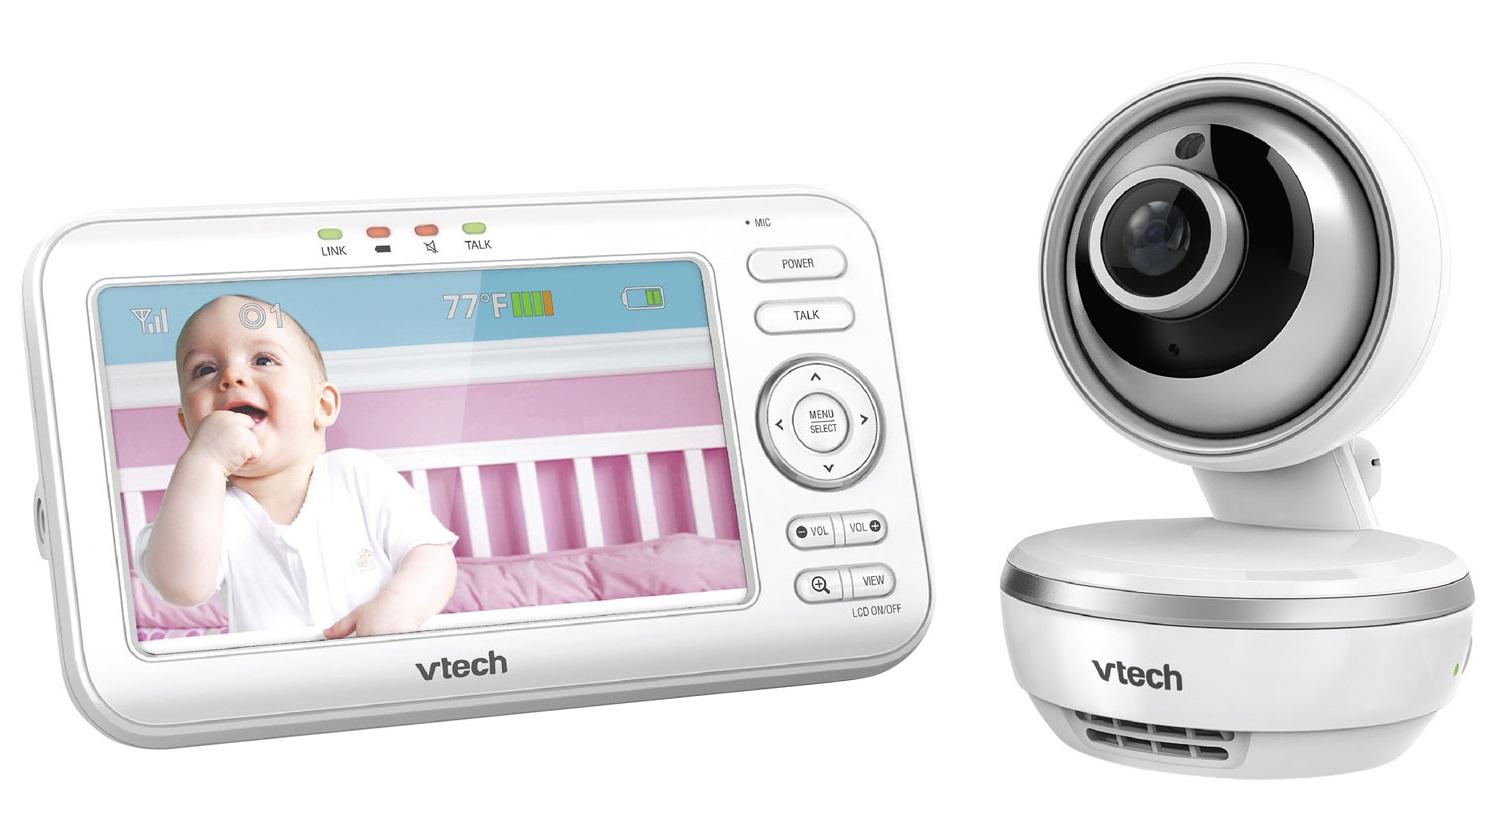 VTech Video Baby Monitor